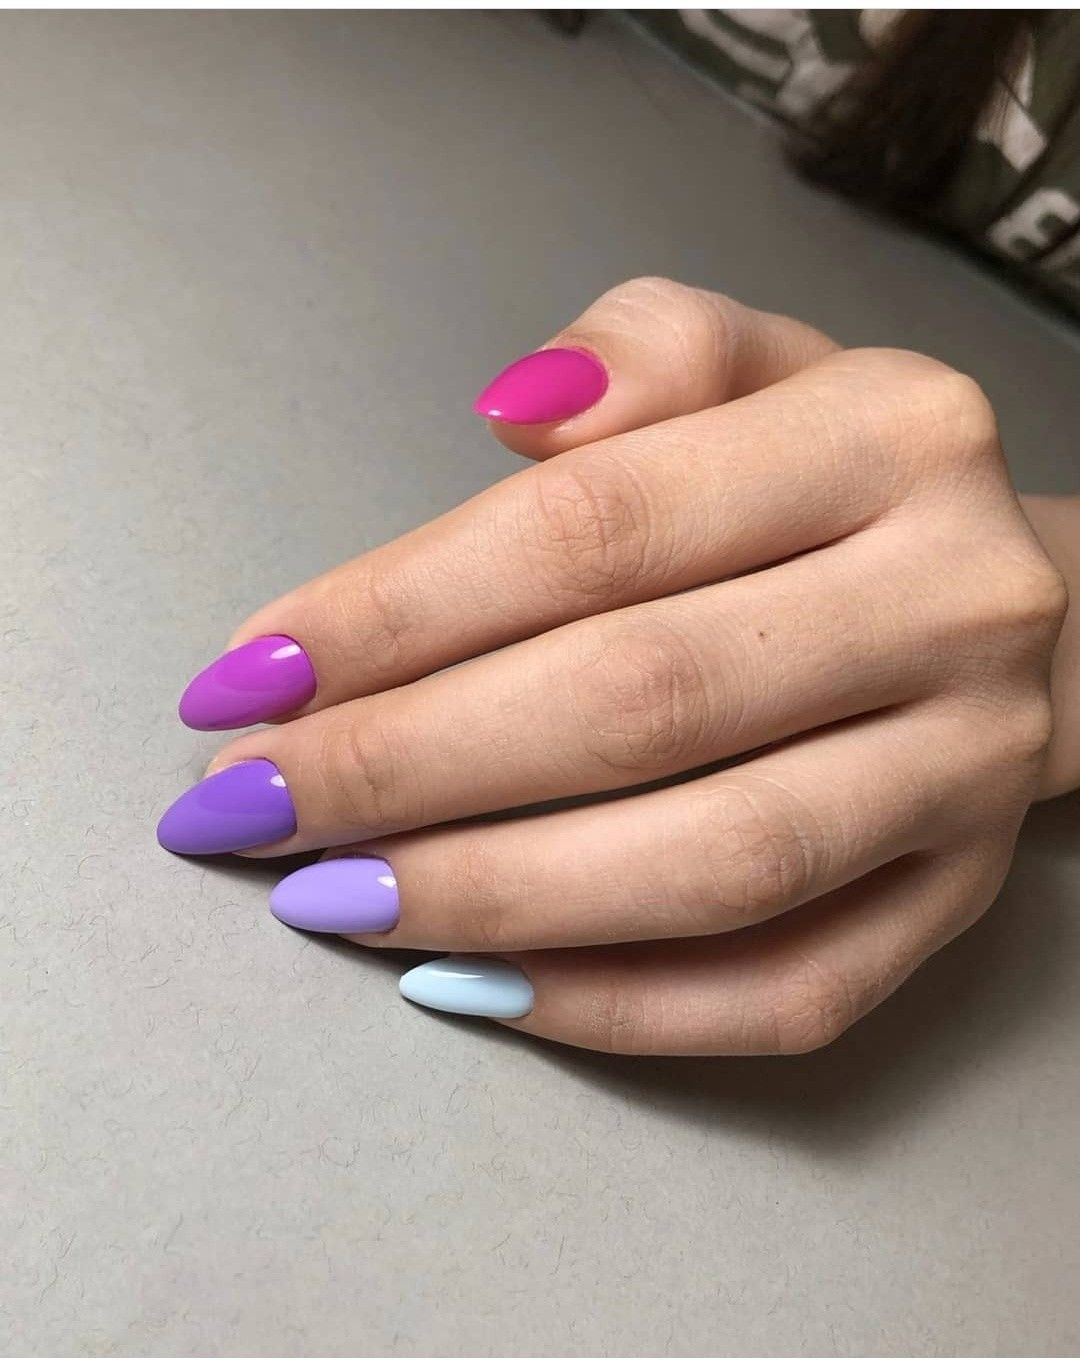 Pin By Grindcore Marilyn On Nails Jednoduche Nehty Gelove Nehty Design Nehtu